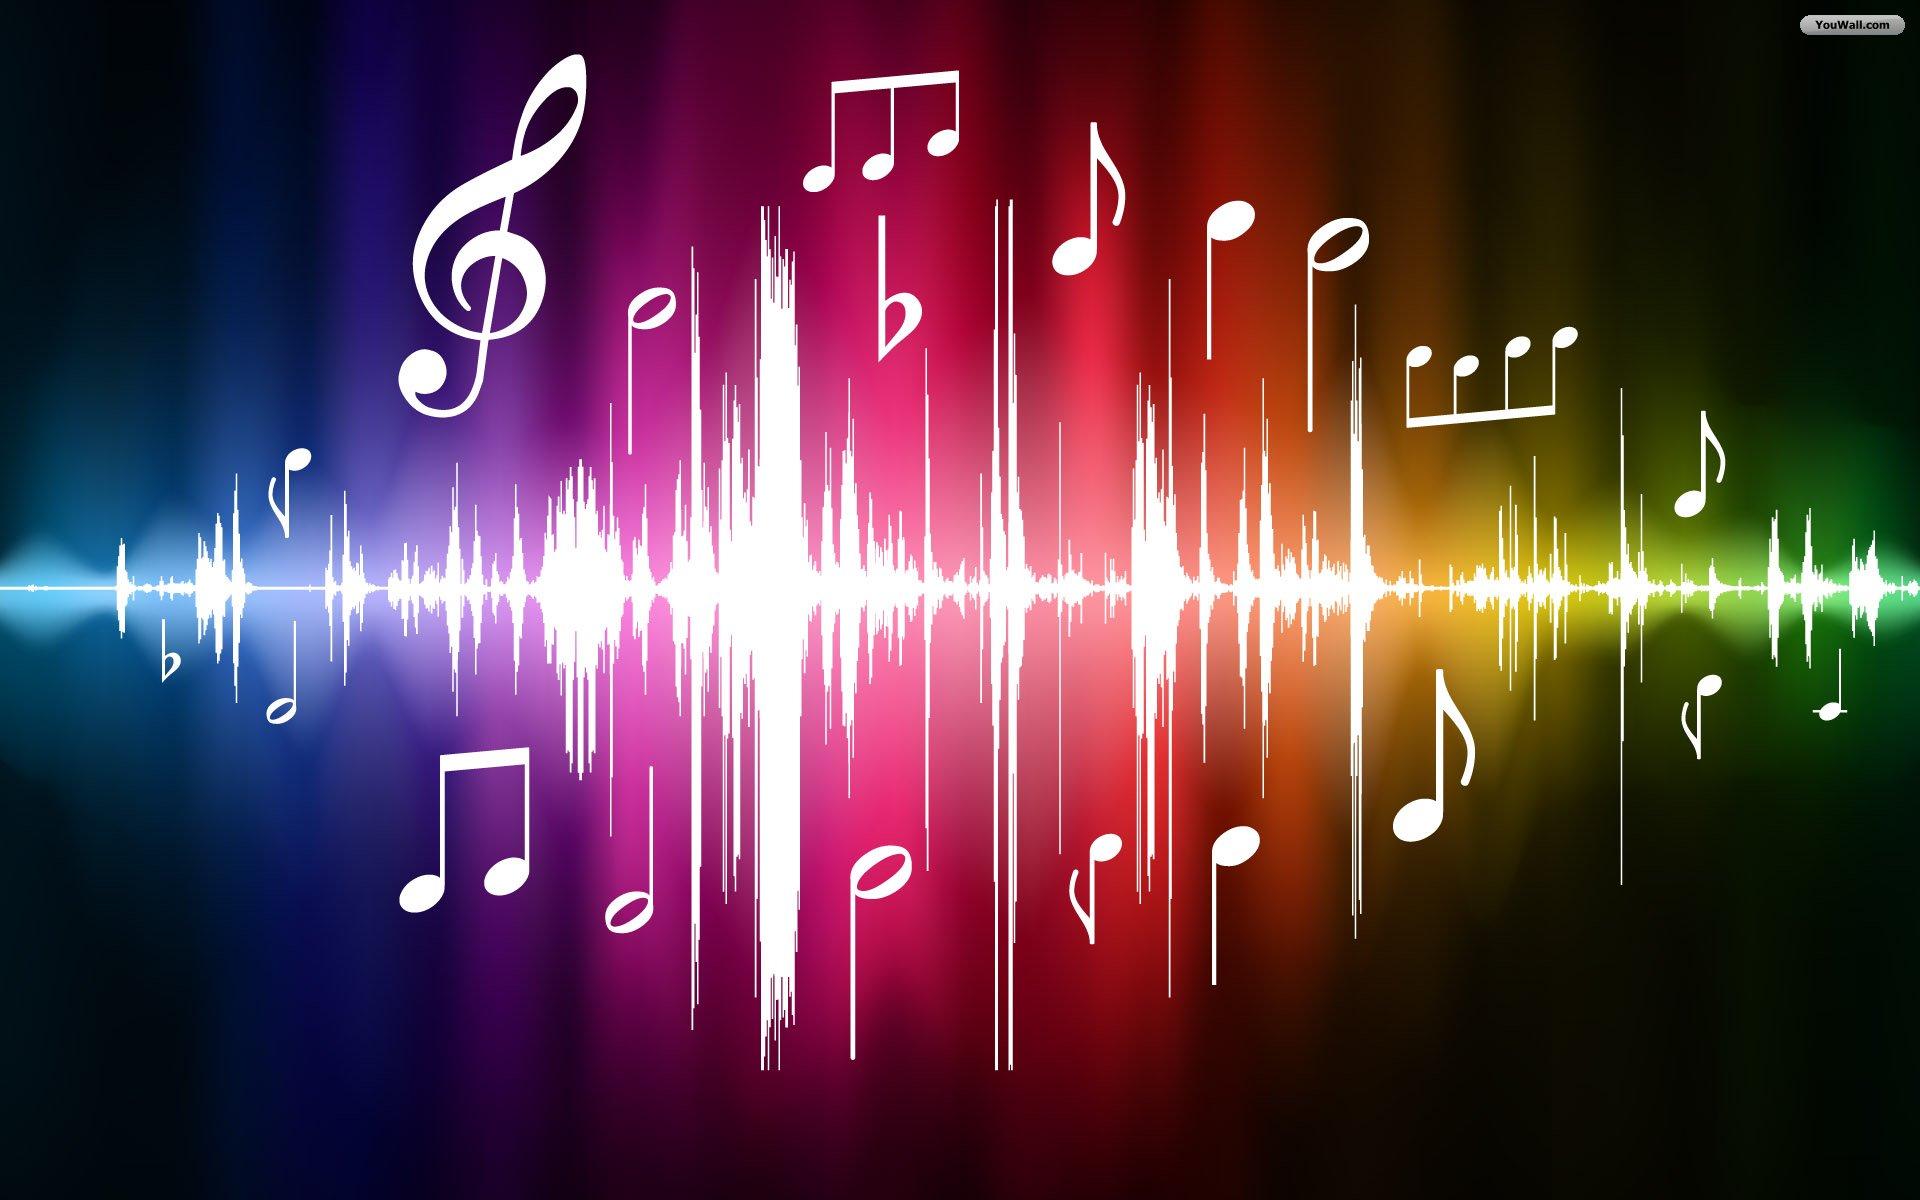 48+] I Love Music Wallpaper on WallpaperSafari